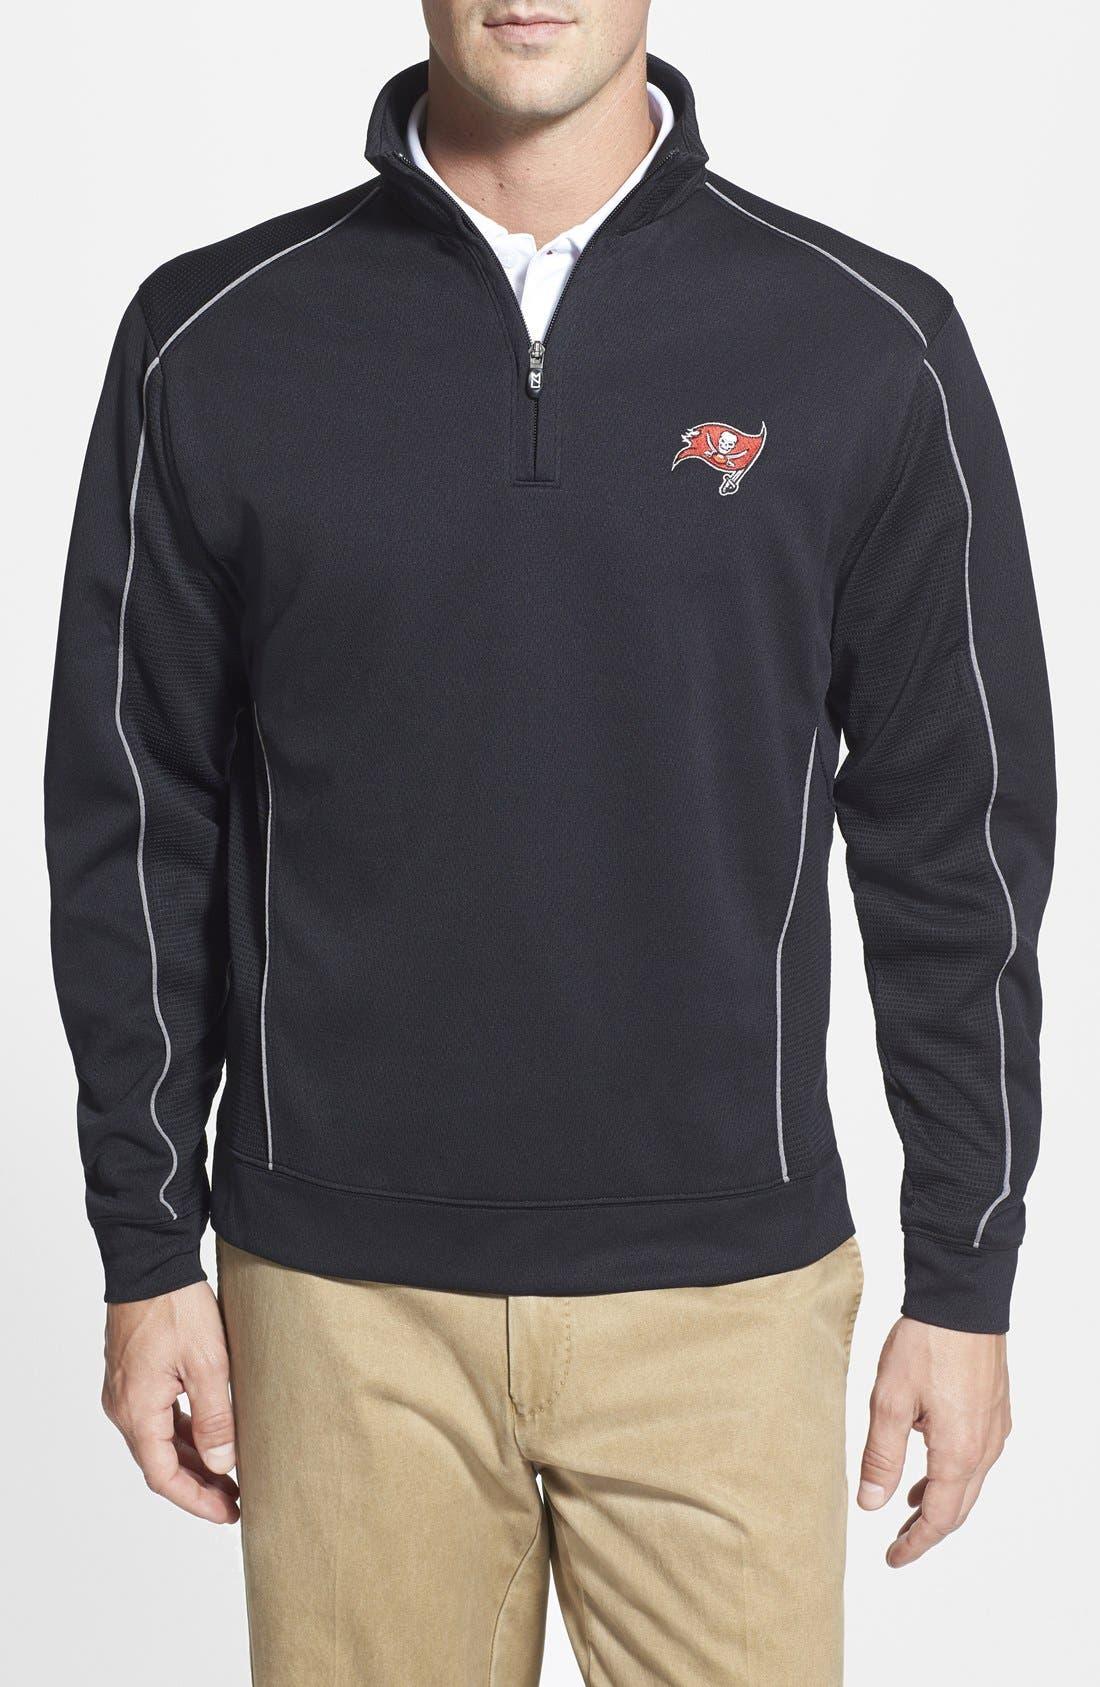 Tampa Bay Buccaneers - Edge DryTec Moisture Wicking Half Zip Pullover,                         Main,                         color, Black